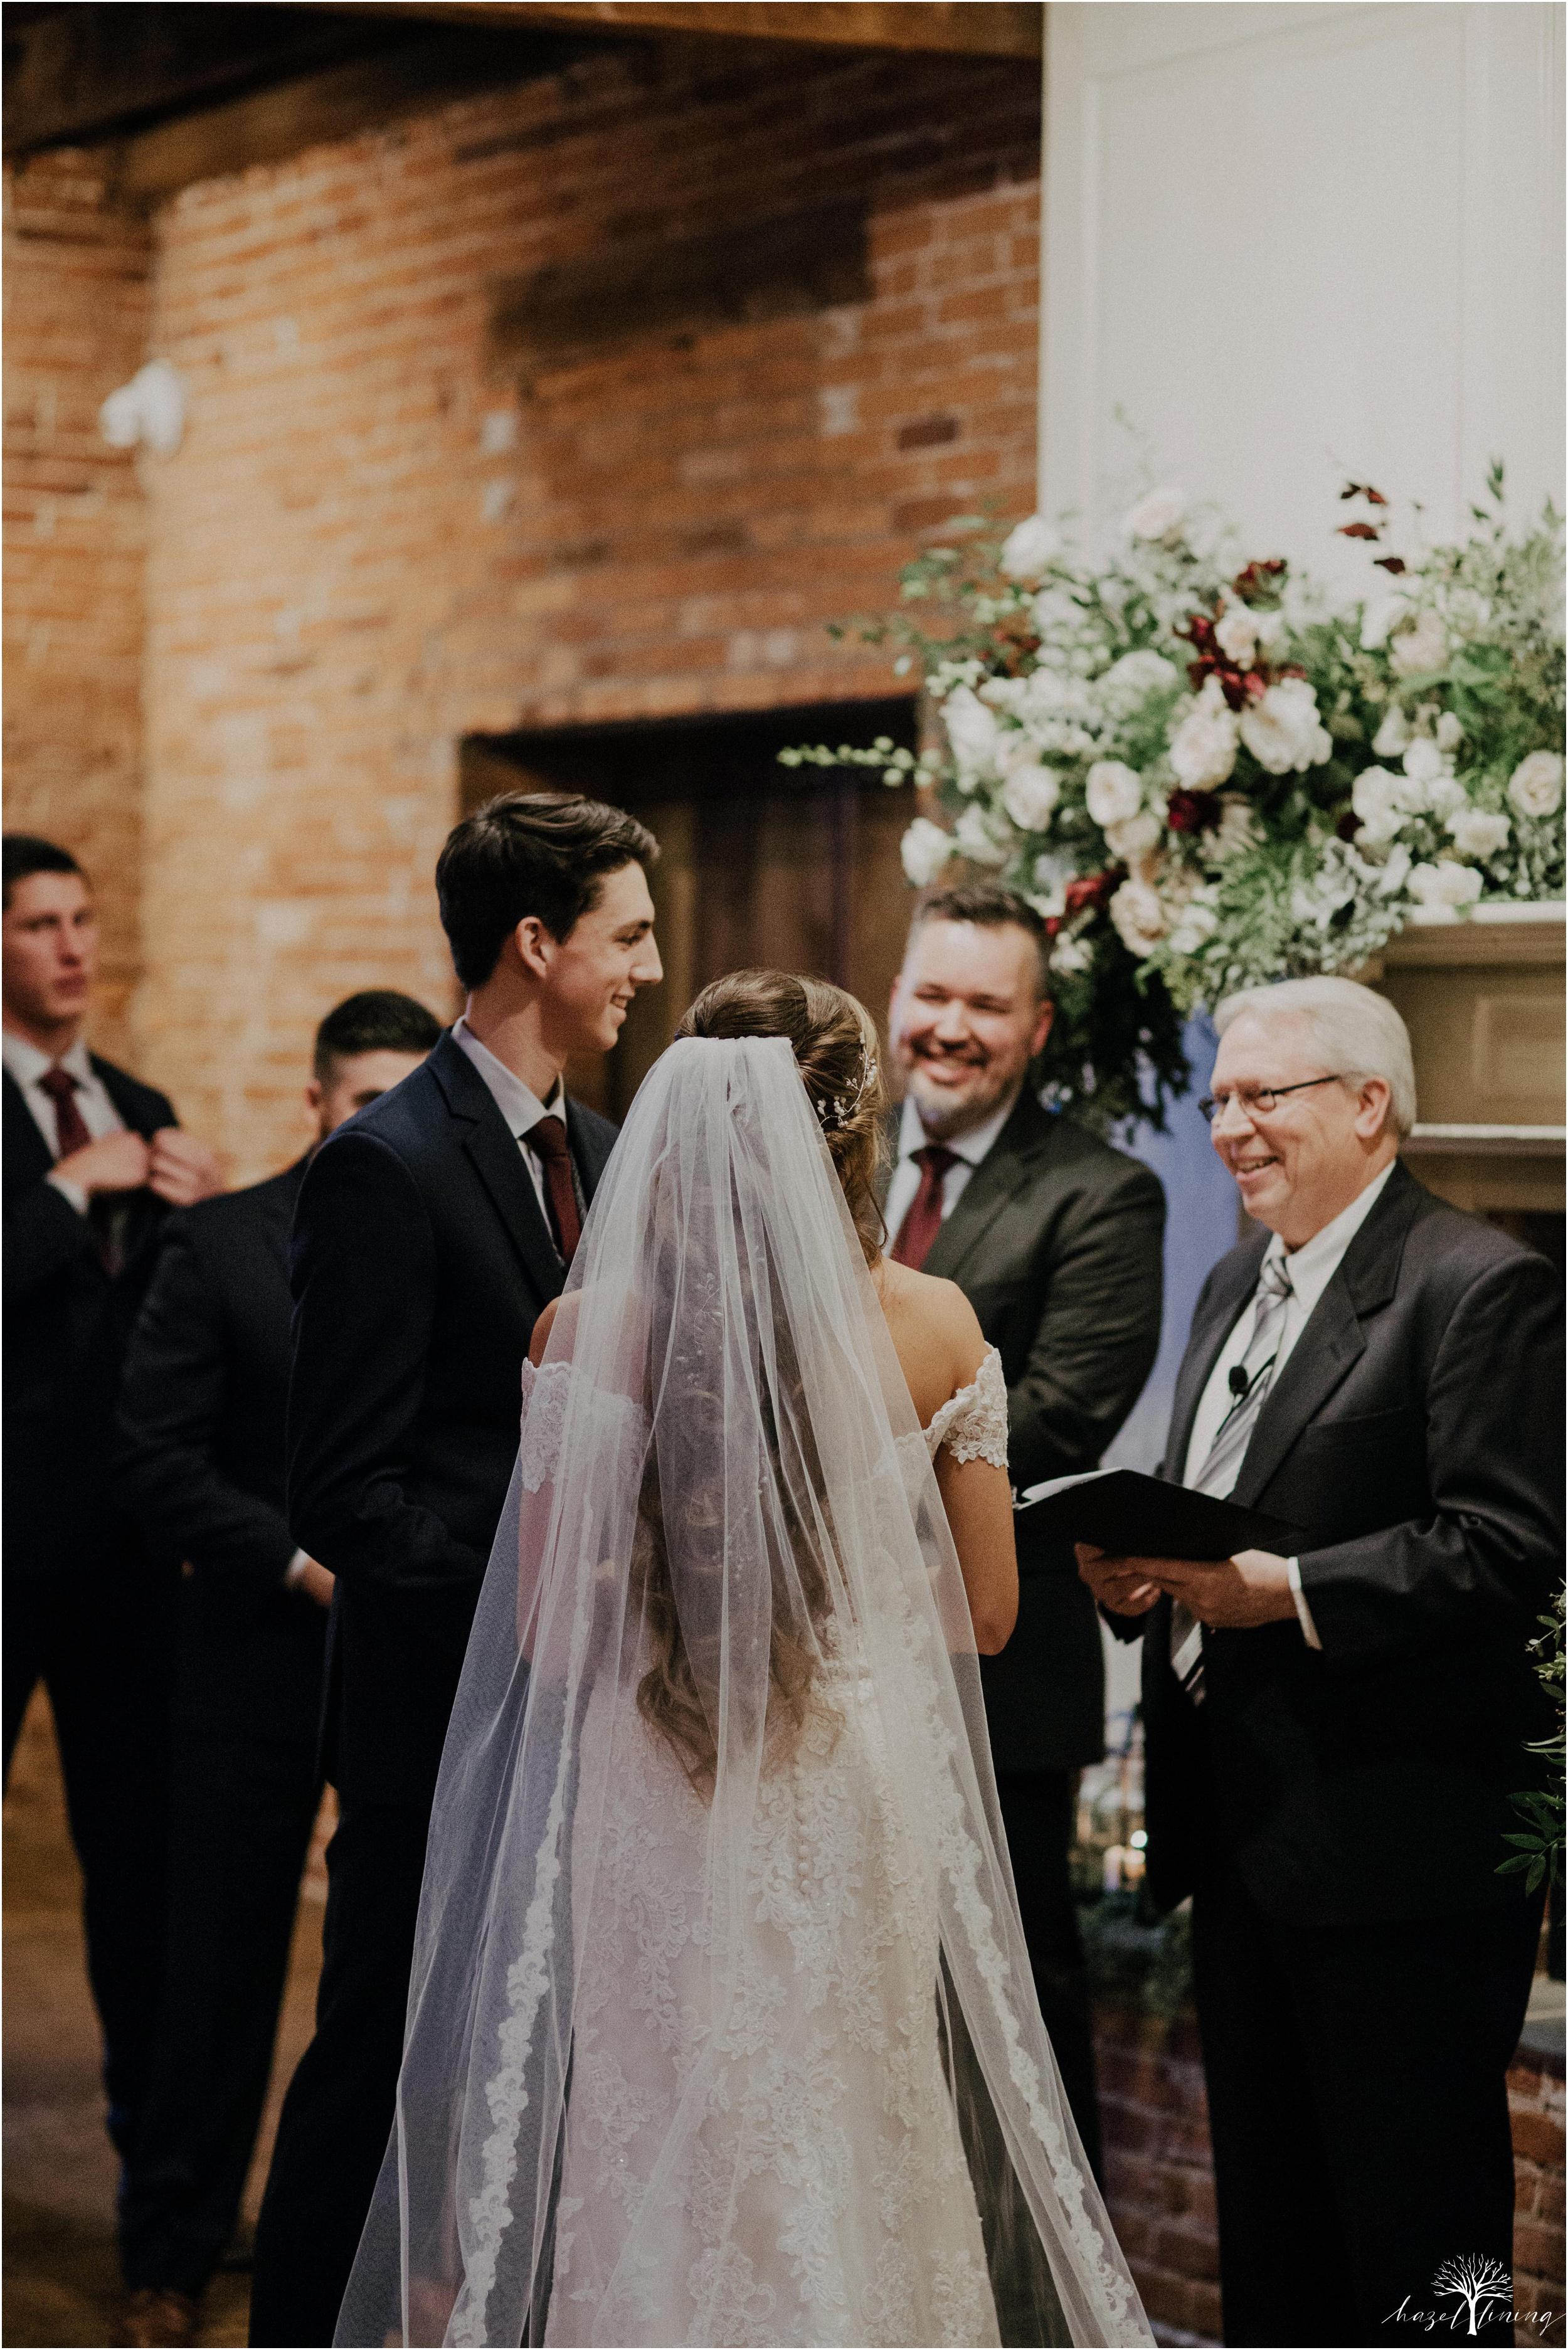 emma-matt-gehringer-the-booking-house-lancaster-manhiem-pennsylvania-winter-wedding_0062.jpg